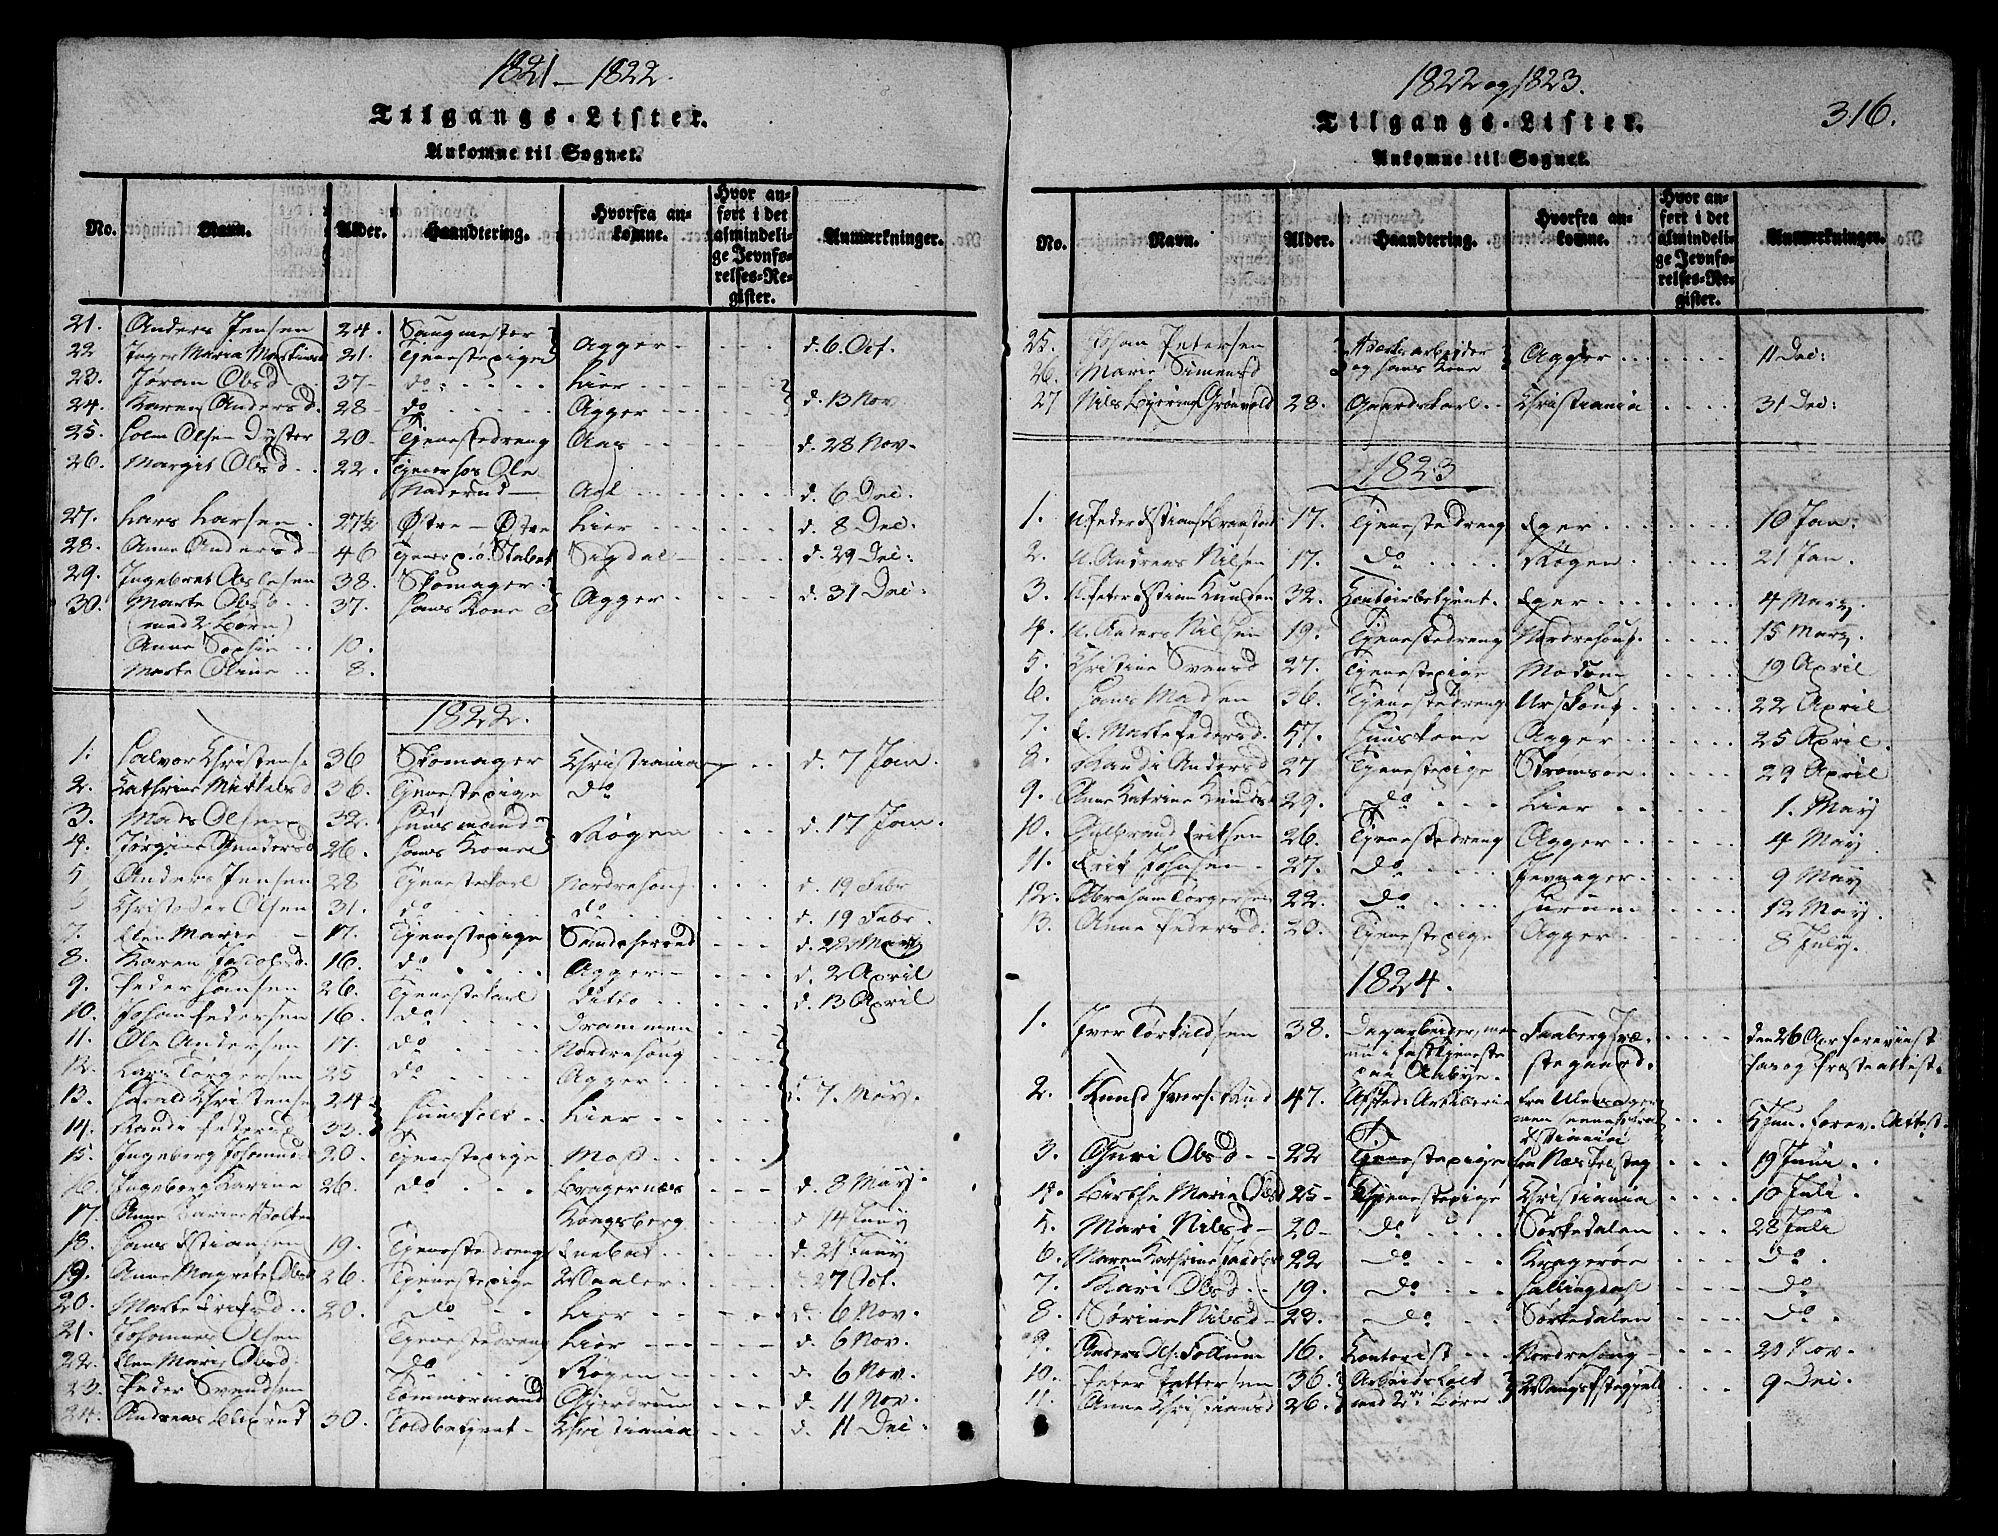 SAO, Asker prestekontor Kirkebøker, G/Ga/L0001: Klokkerbok nr. I 1, 1814-1830, s. 316